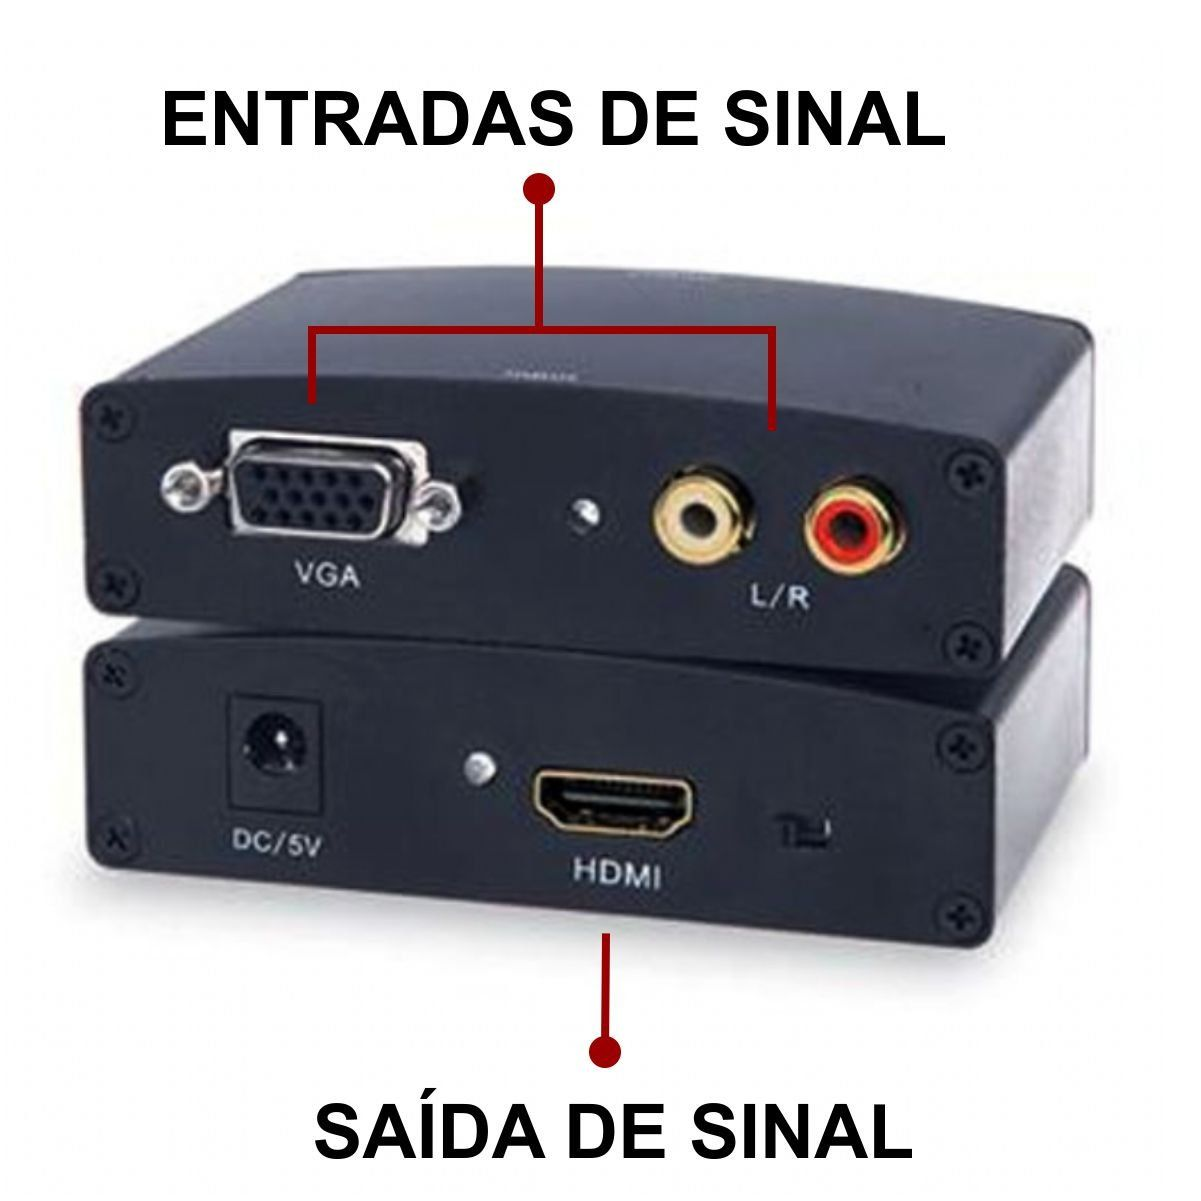 Conversor Vga Fêmea p/ Hdmi Fêmea c/ Áudio XT-2020